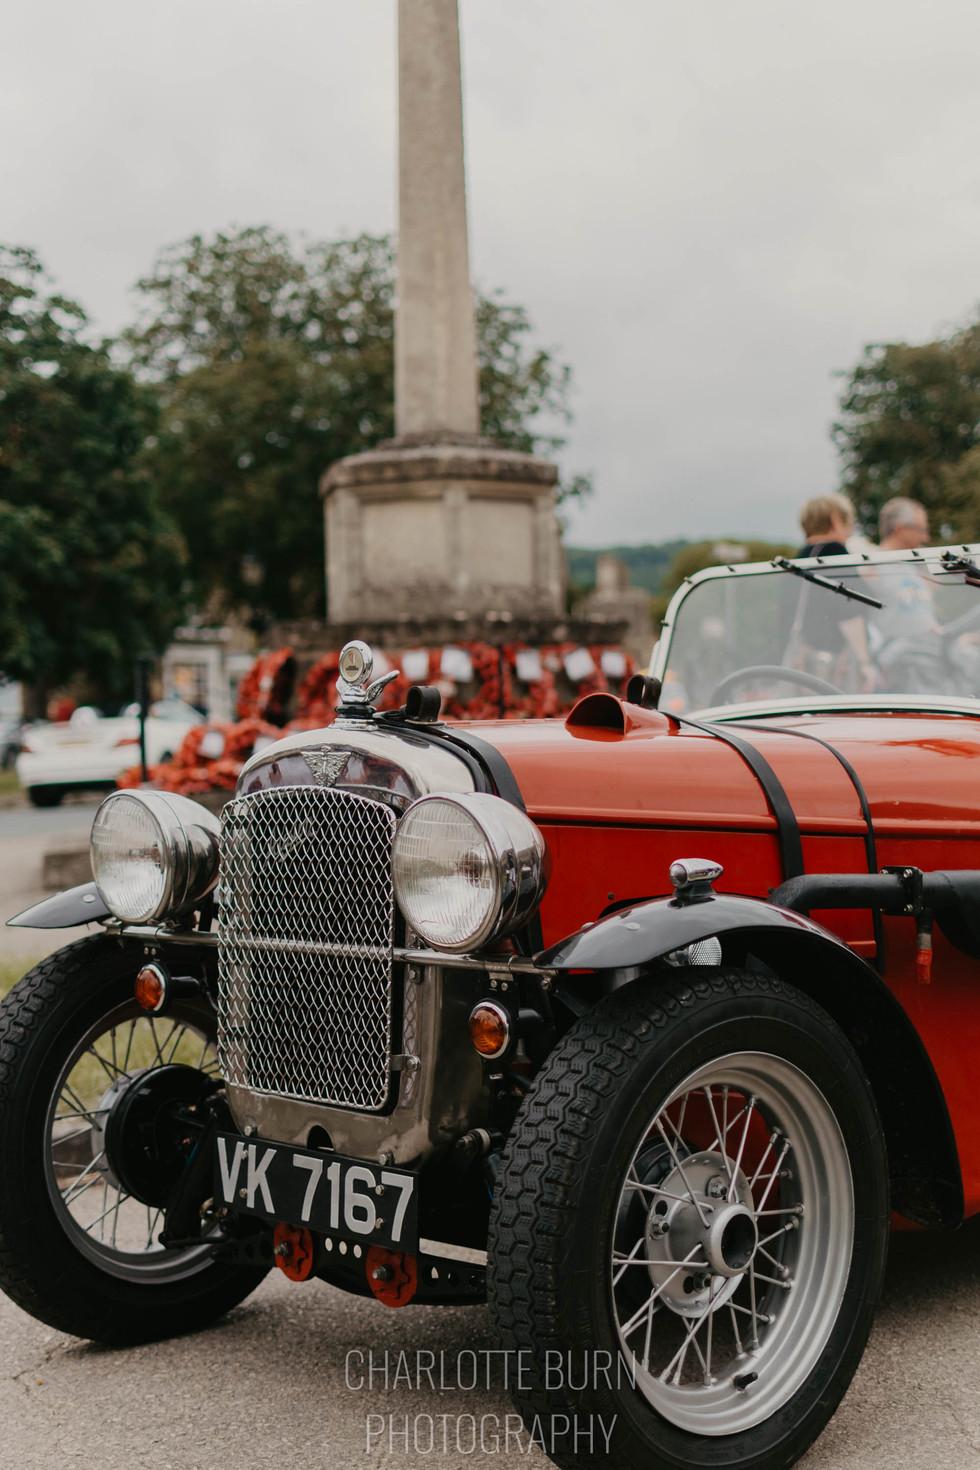 Boradway UK Car Show 2019, Charlotte Burn Photography-35